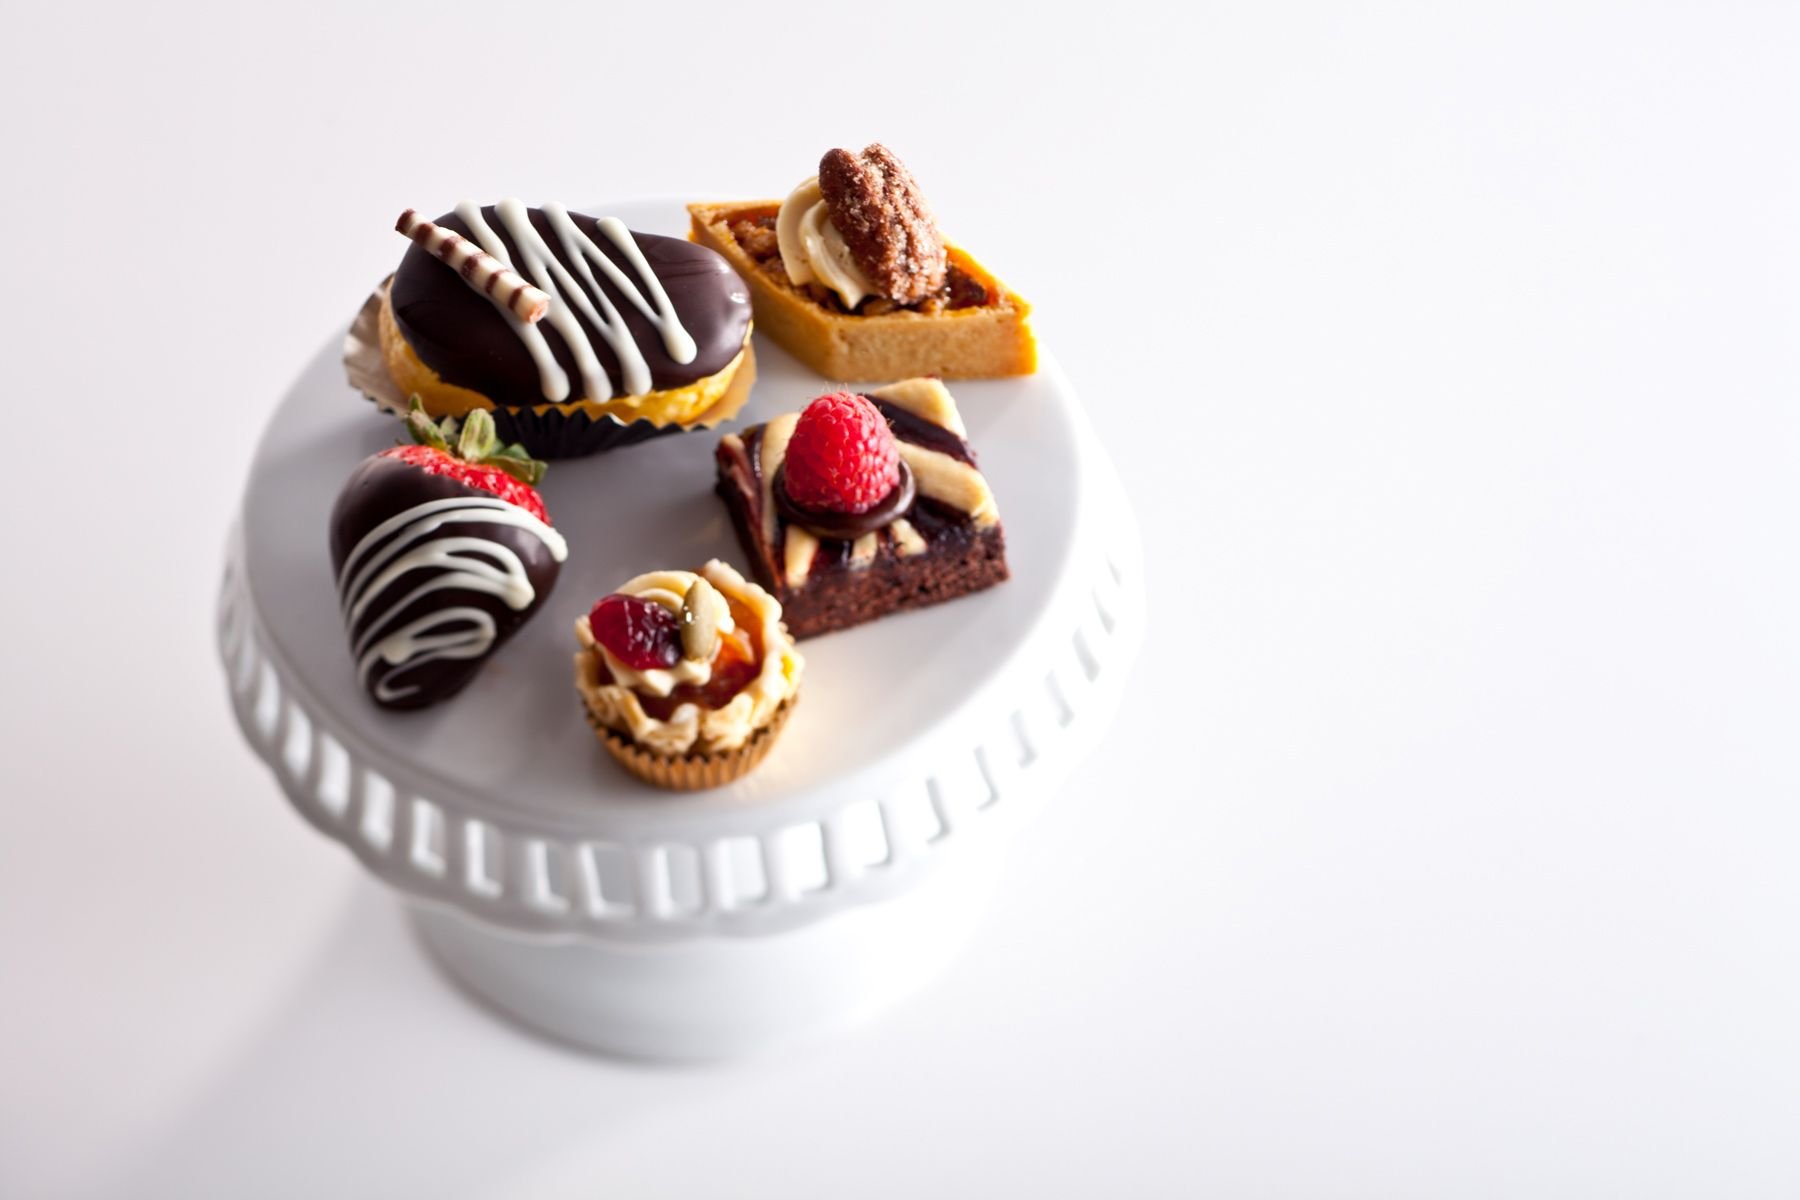 Desserts-on-pedisal-Jessica-Weiss-Union-League-of-Chicago.jpg